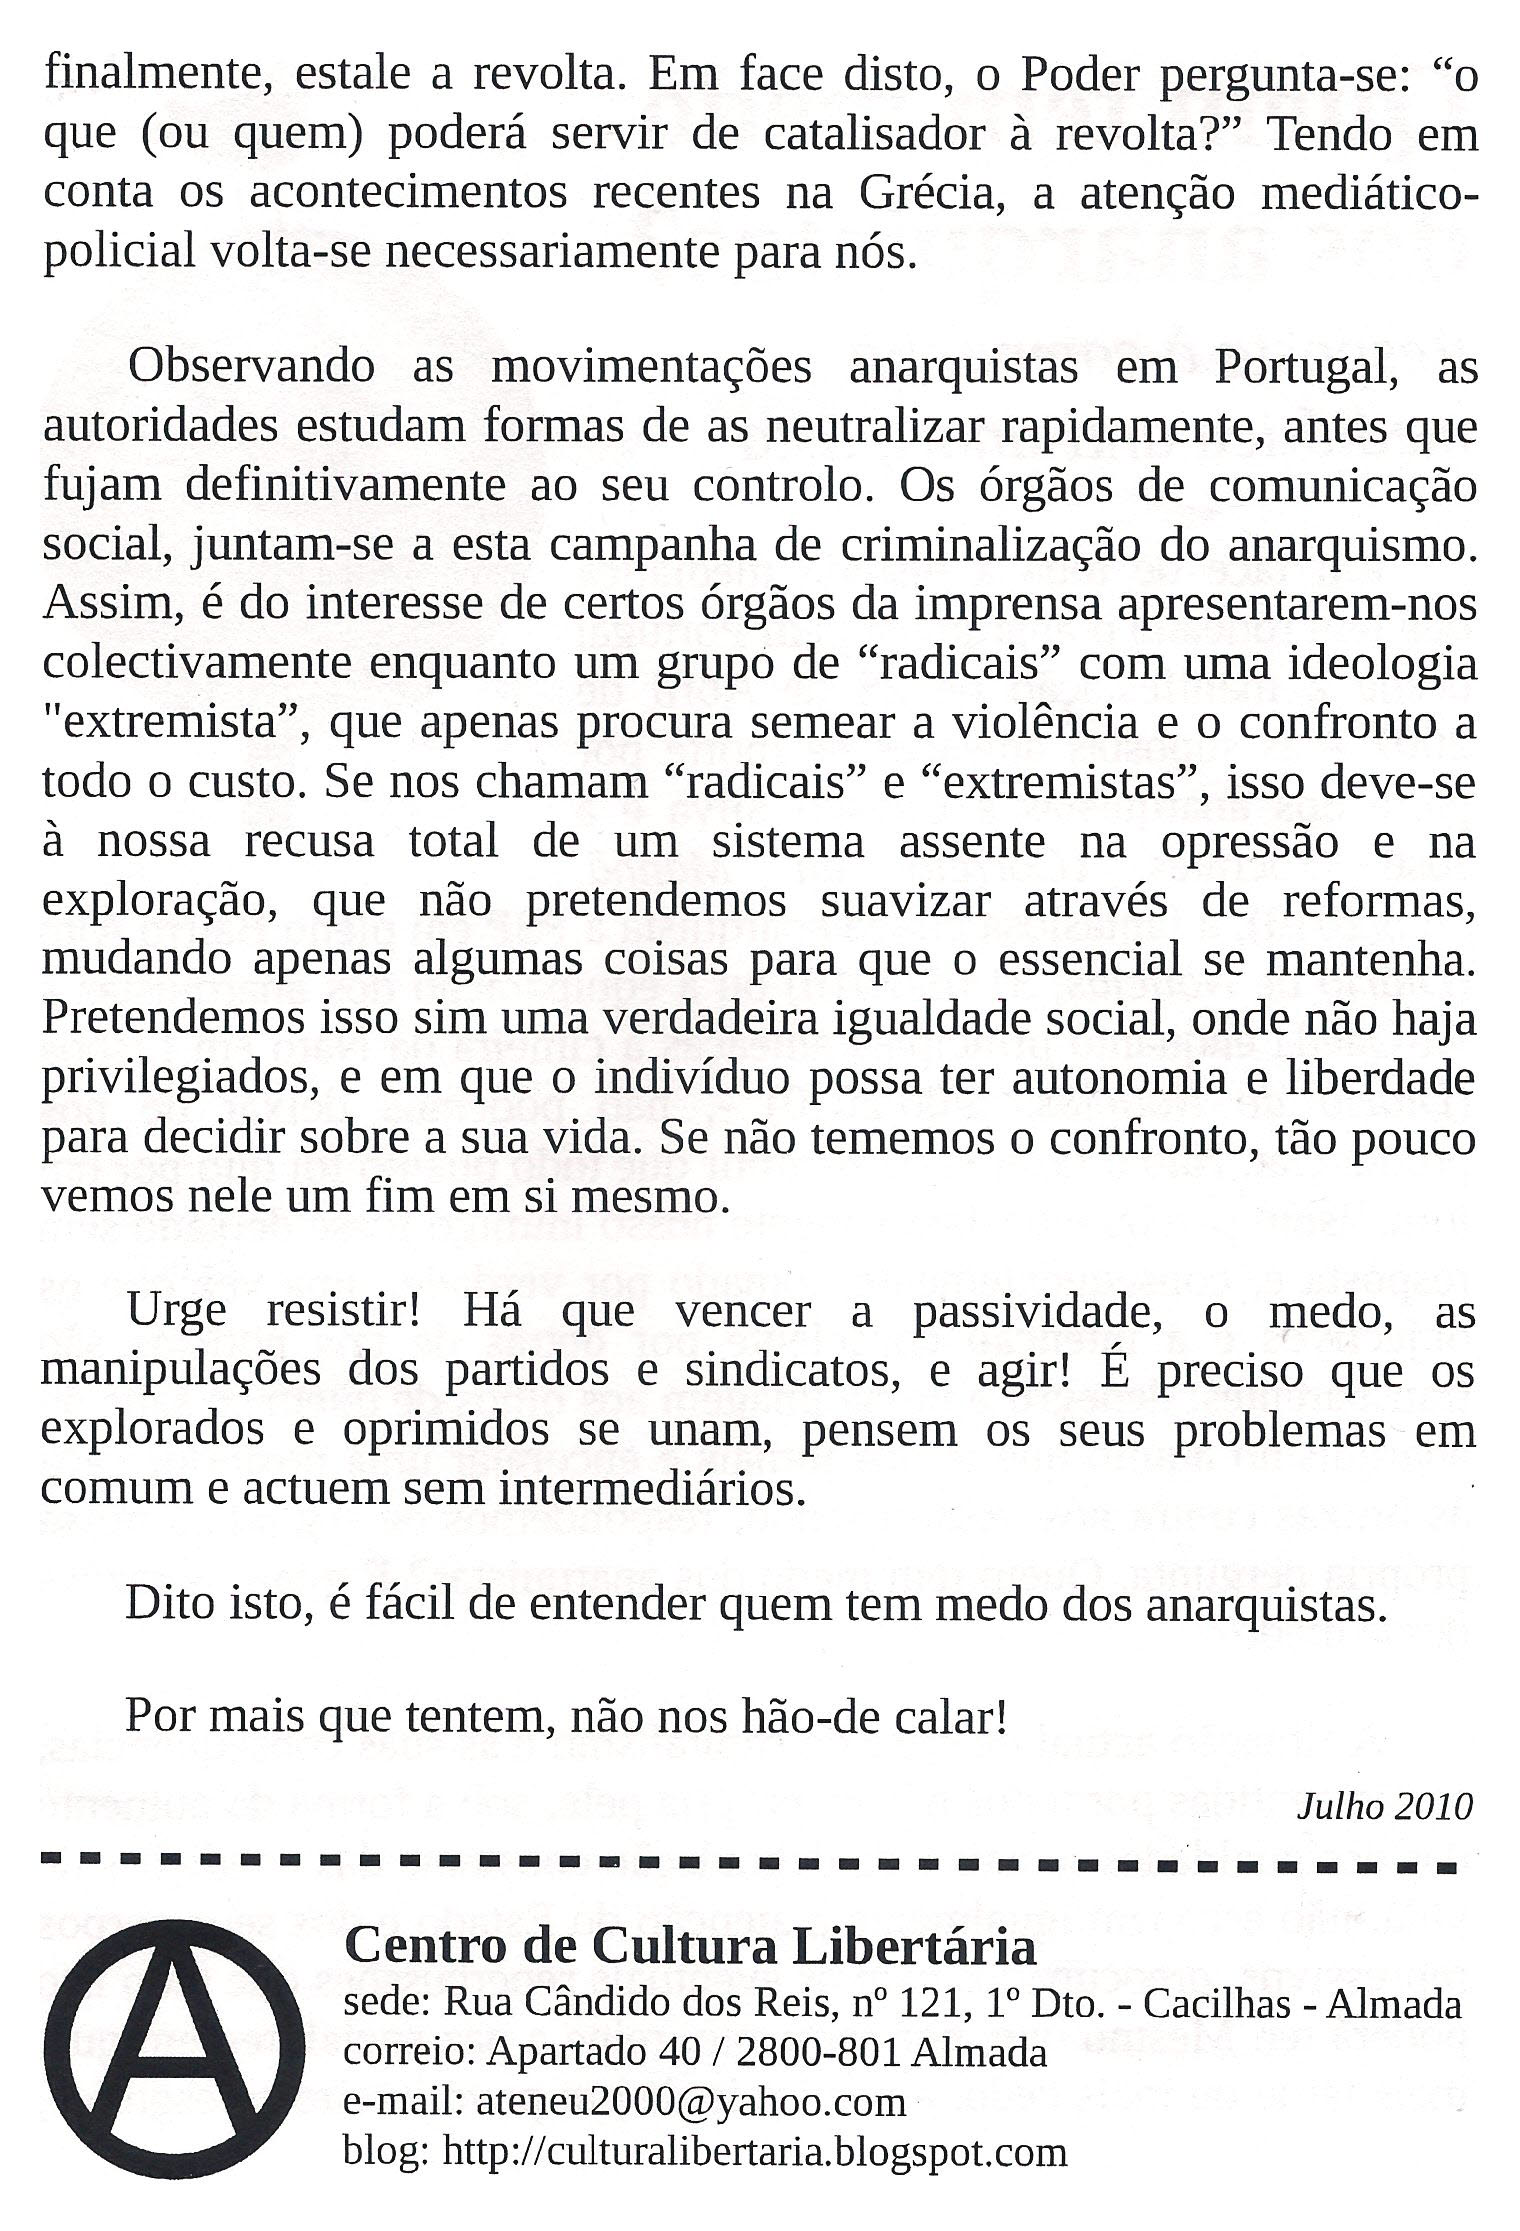 Panfleto anarquista 2